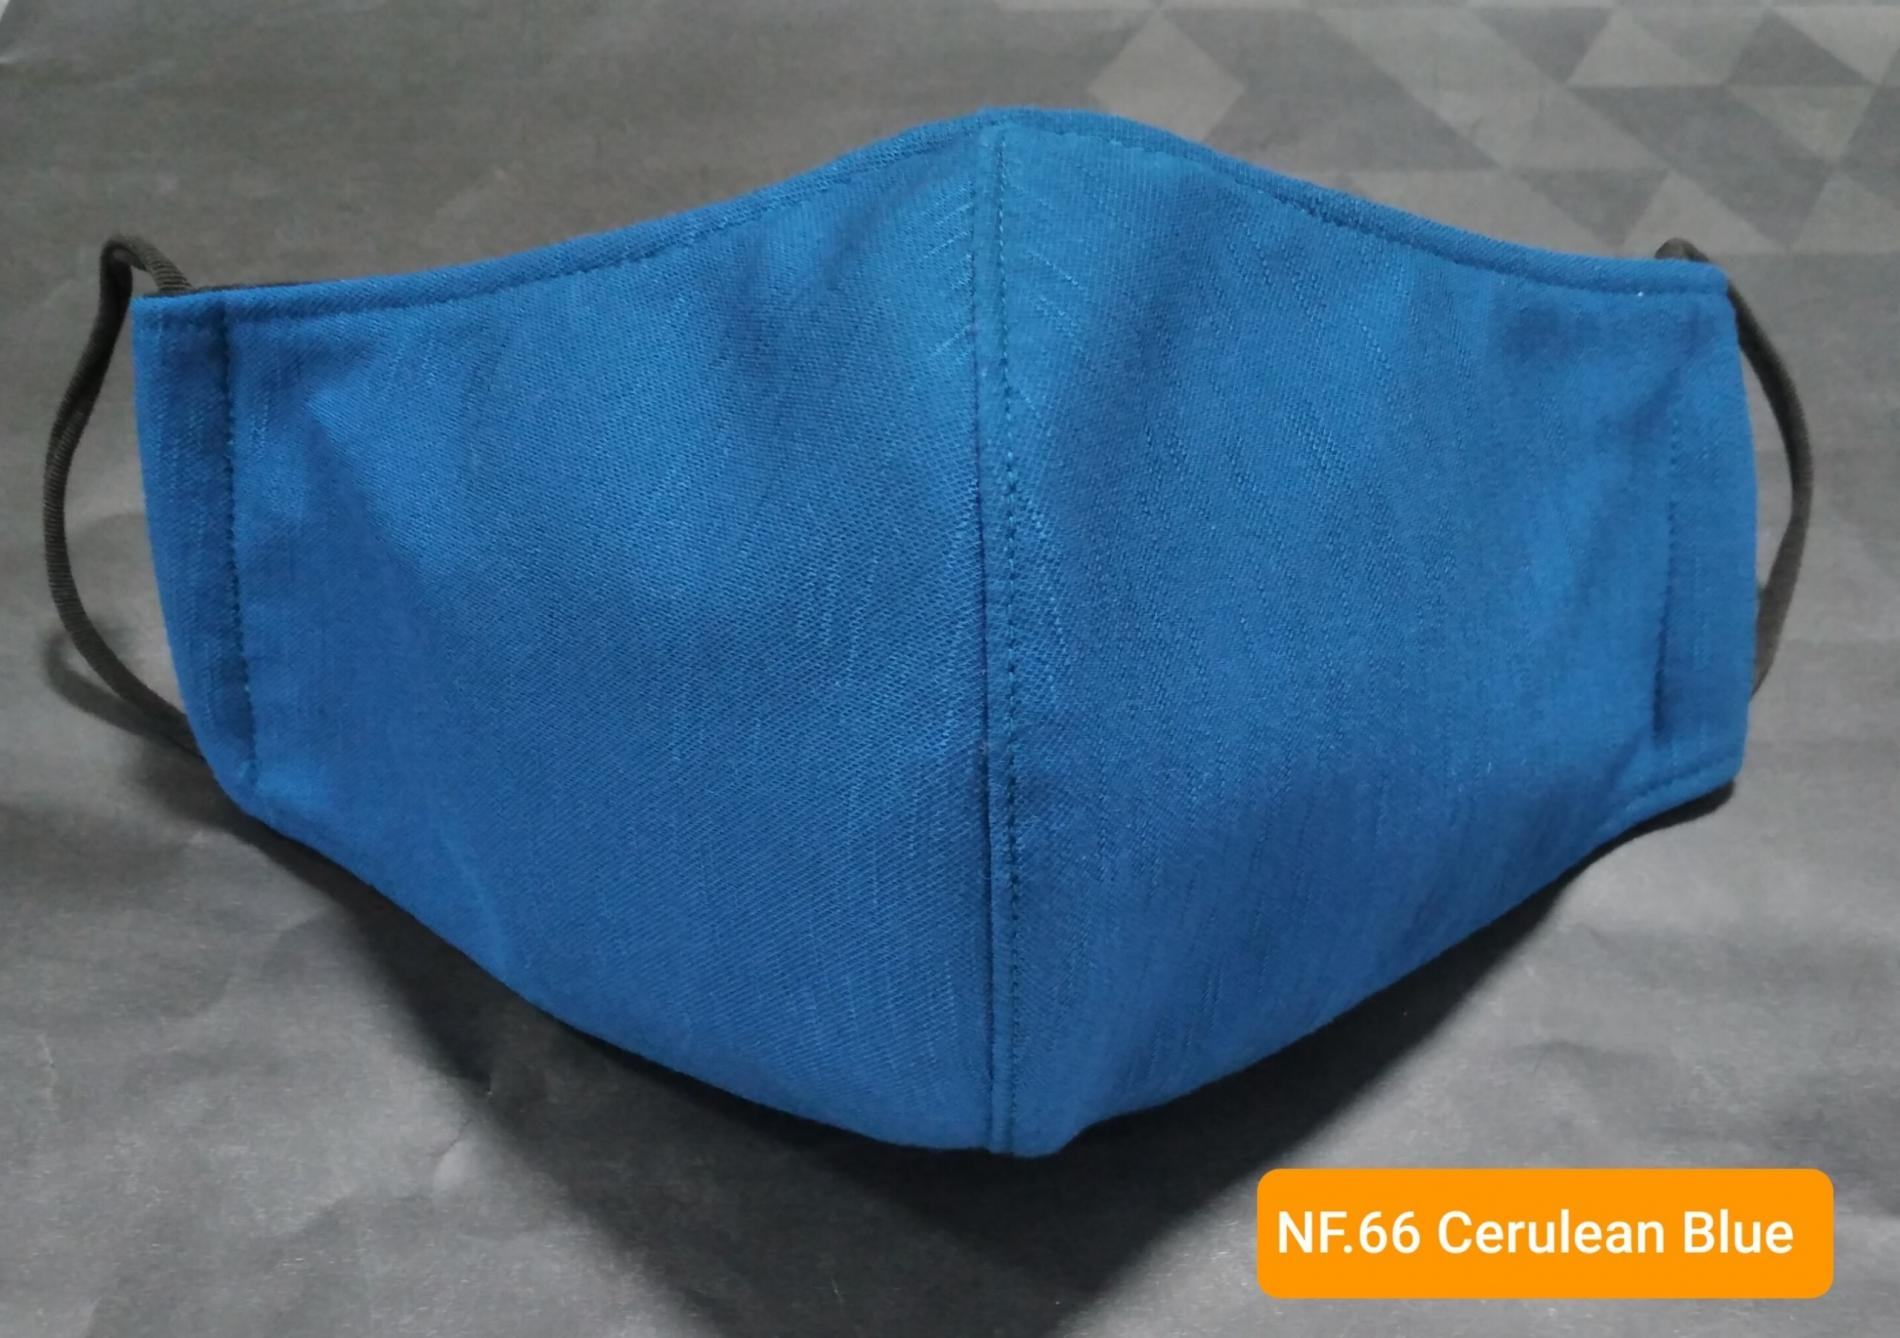 Mẫu Khẩu Trang Vải NF 66 Cerulean Blue